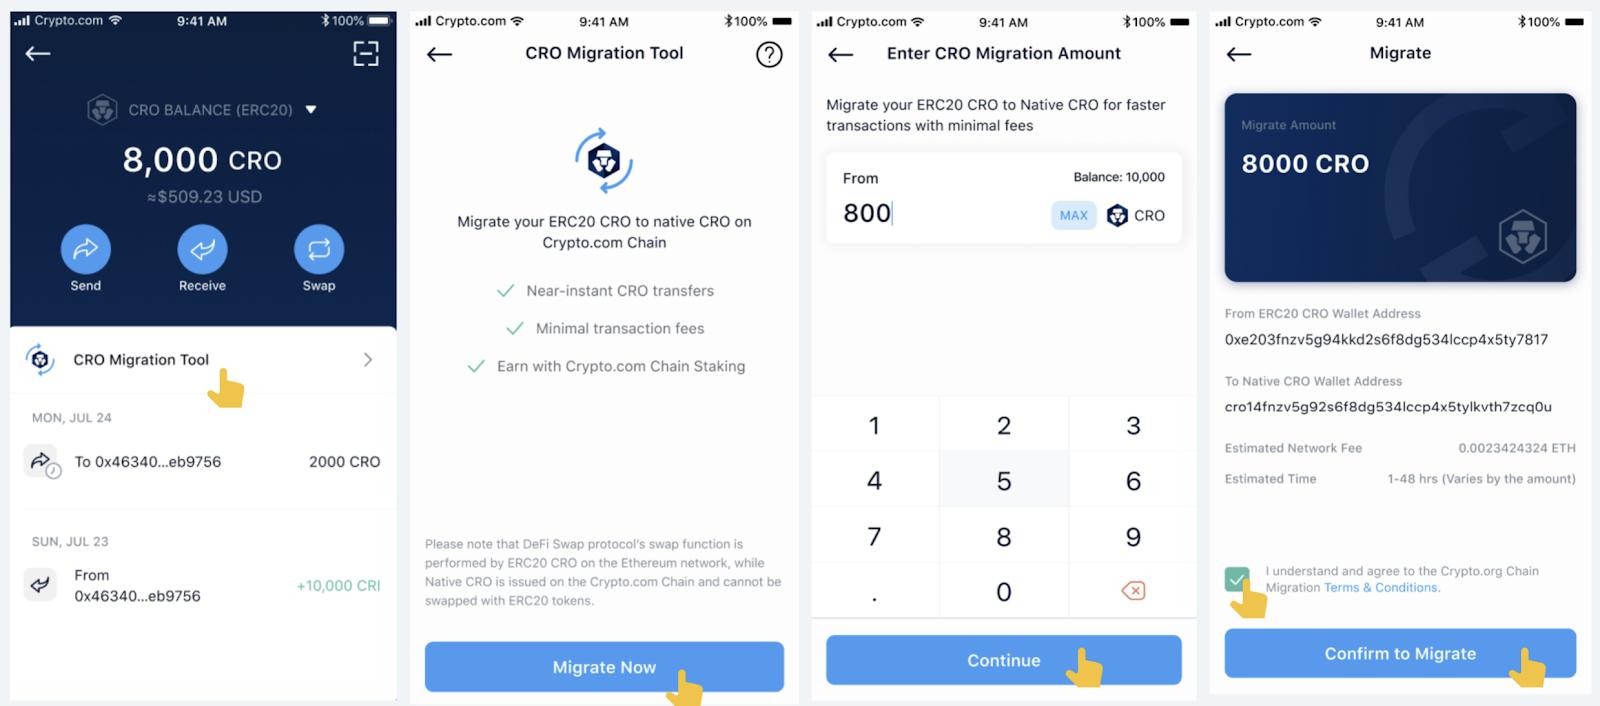 defi-wallet-app